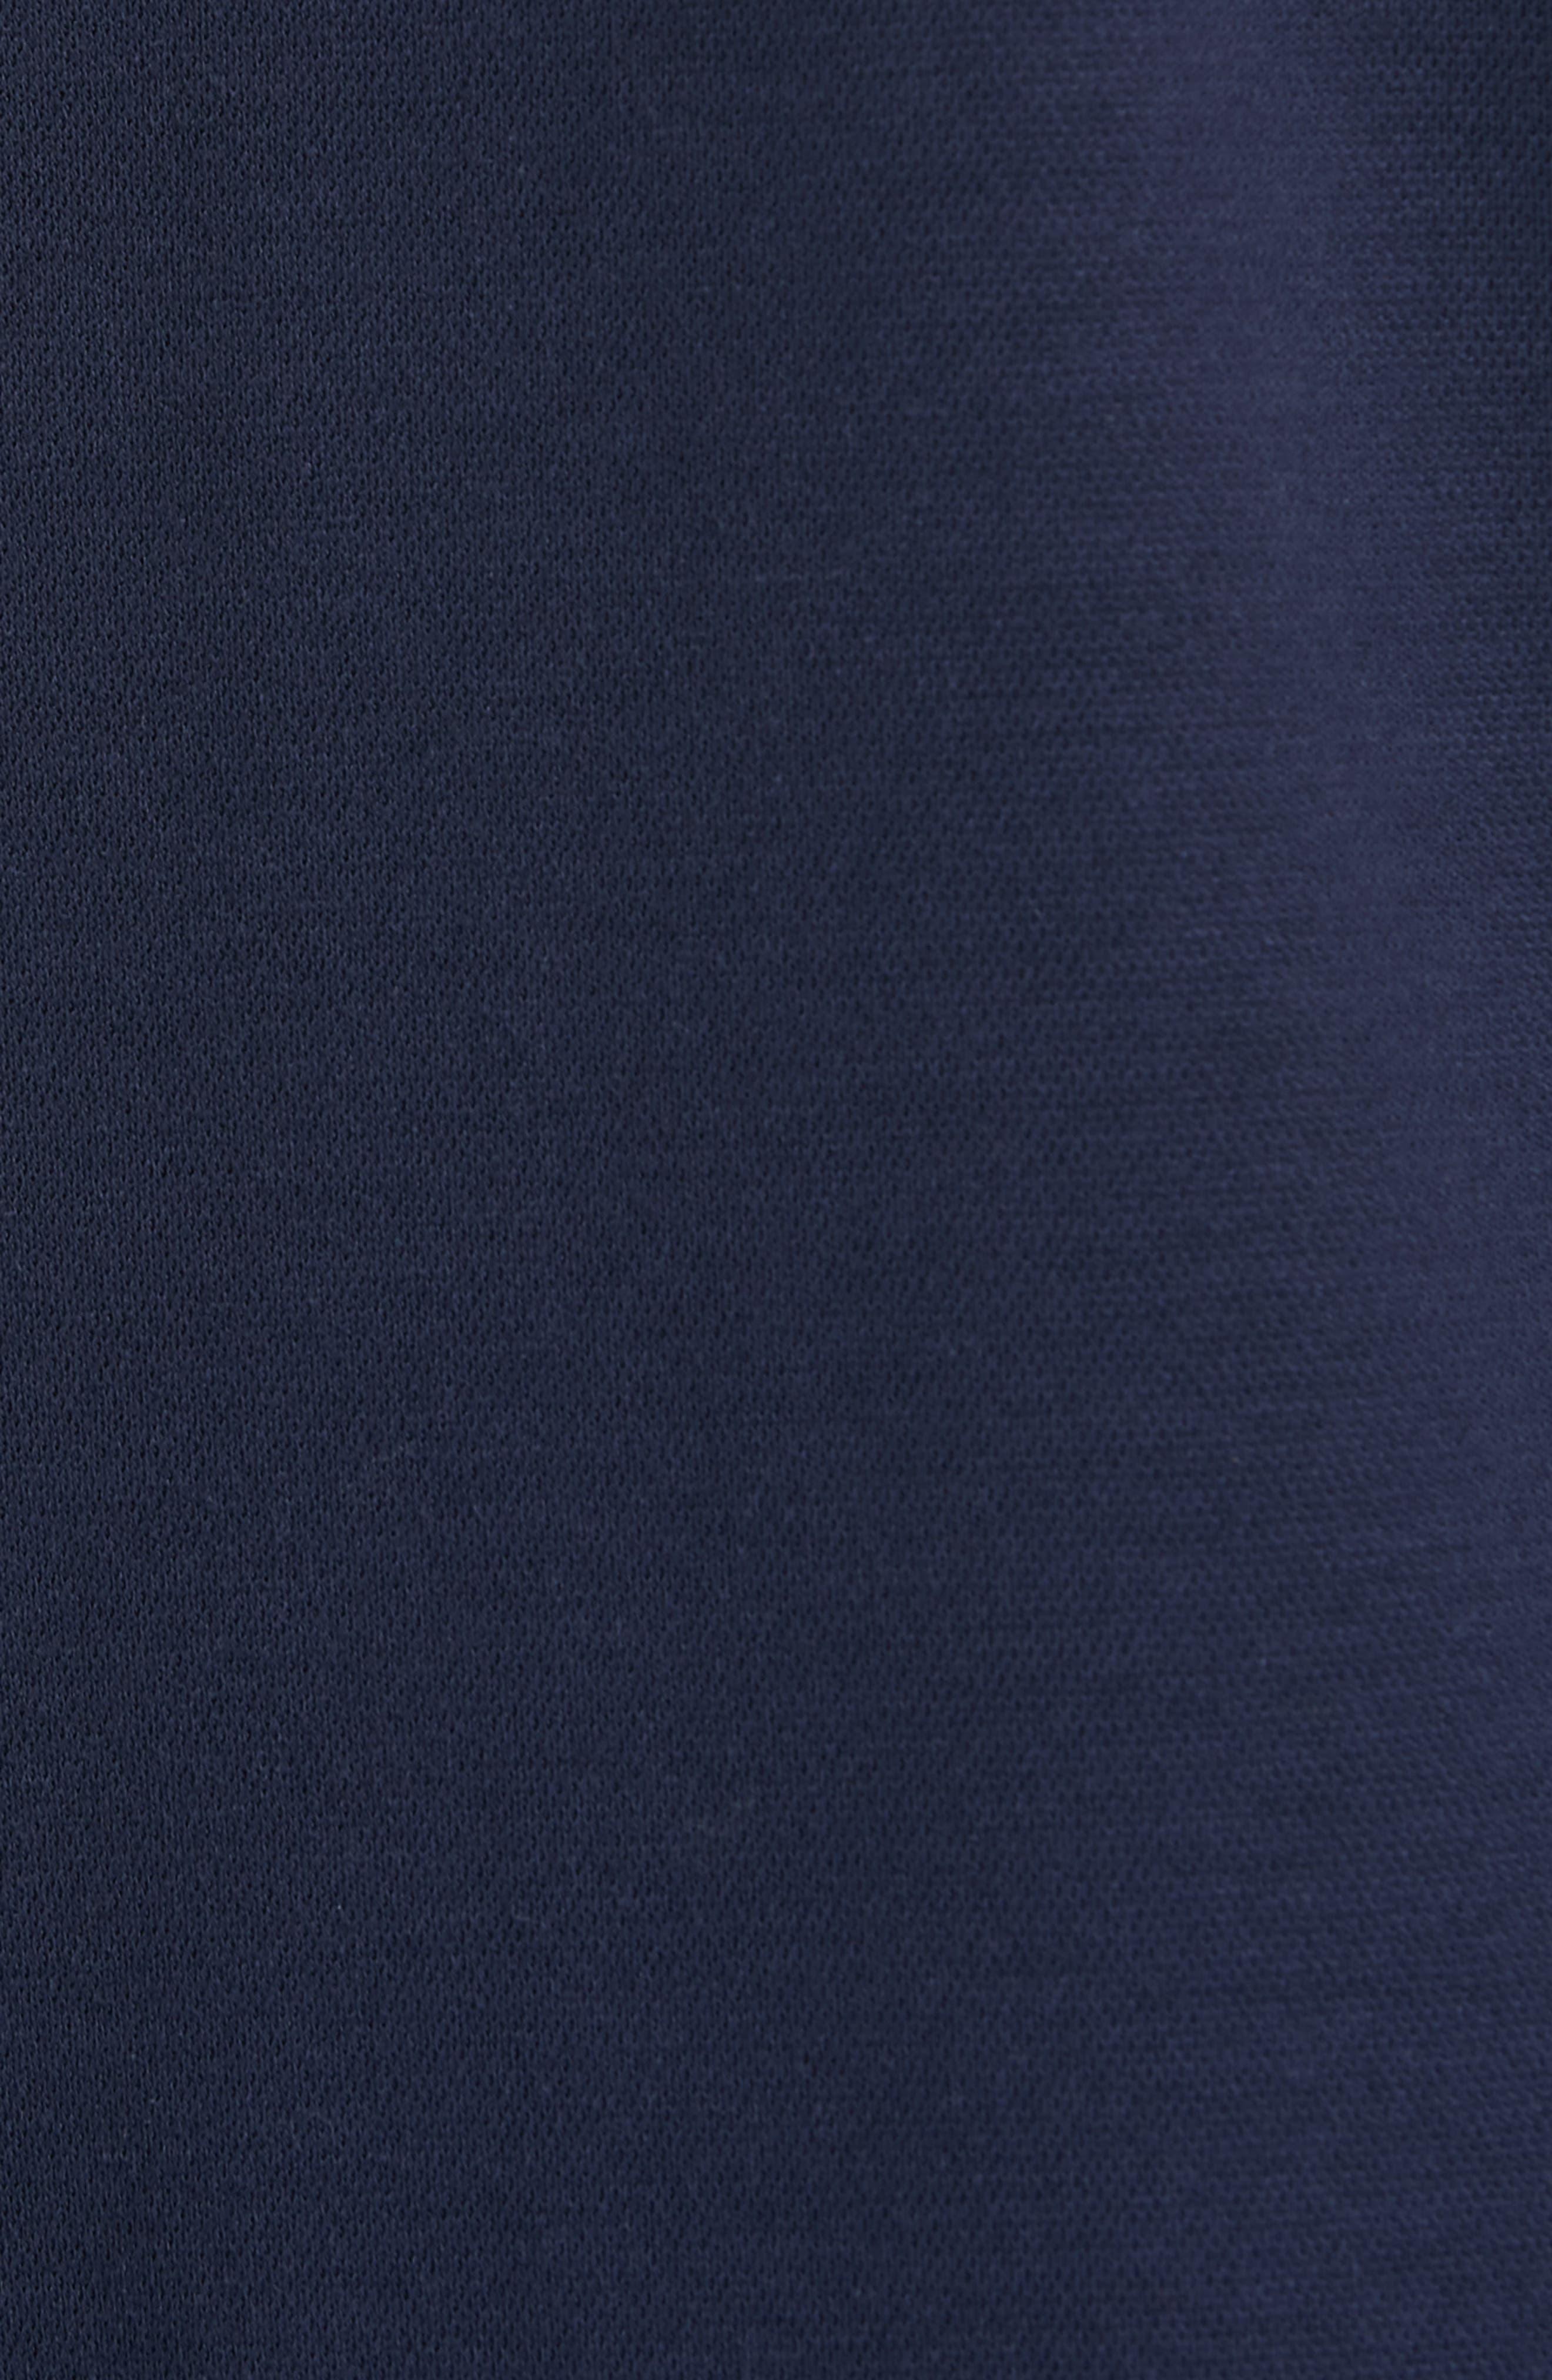 EILEEN FISHER, Knit Shift Dress, Alternate thumbnail 6, color, 402